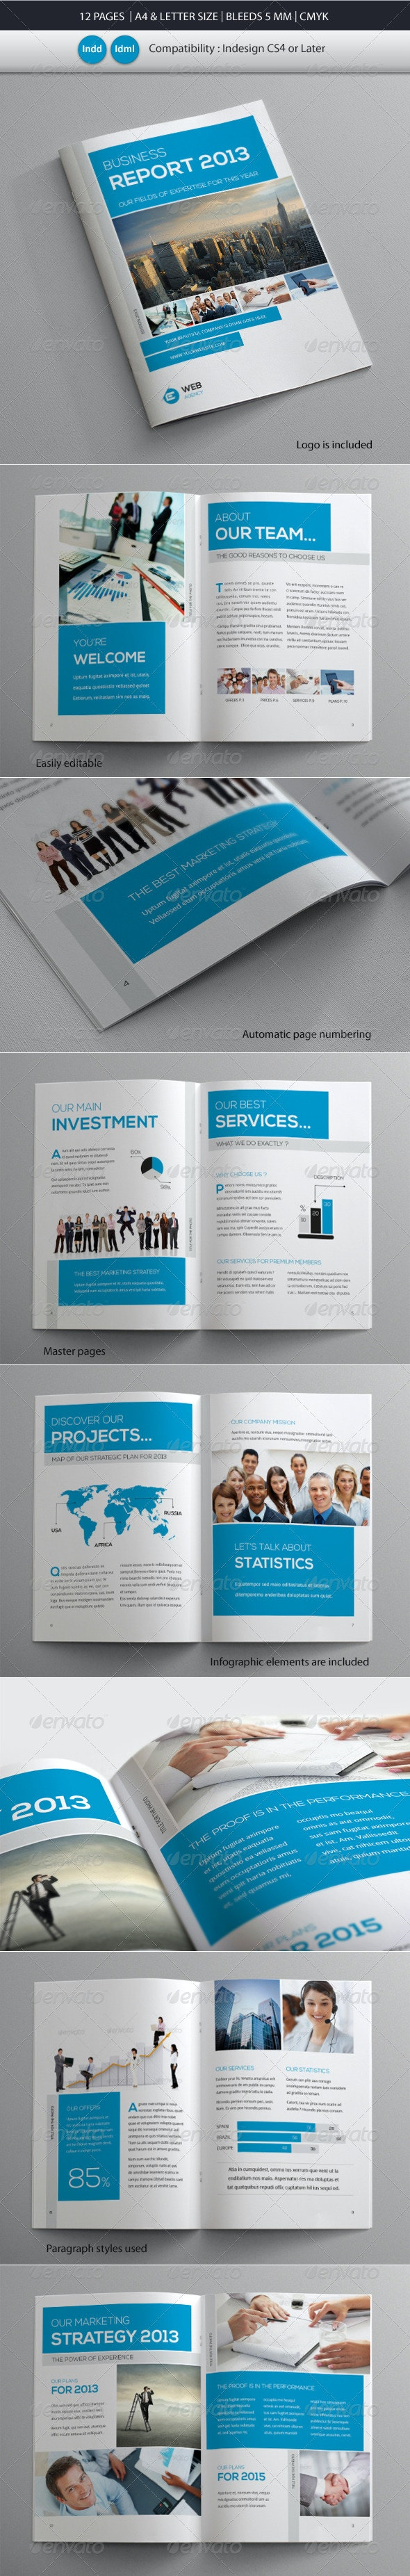 Coprorate & Business Brochure Report Template - Corporate Brochures